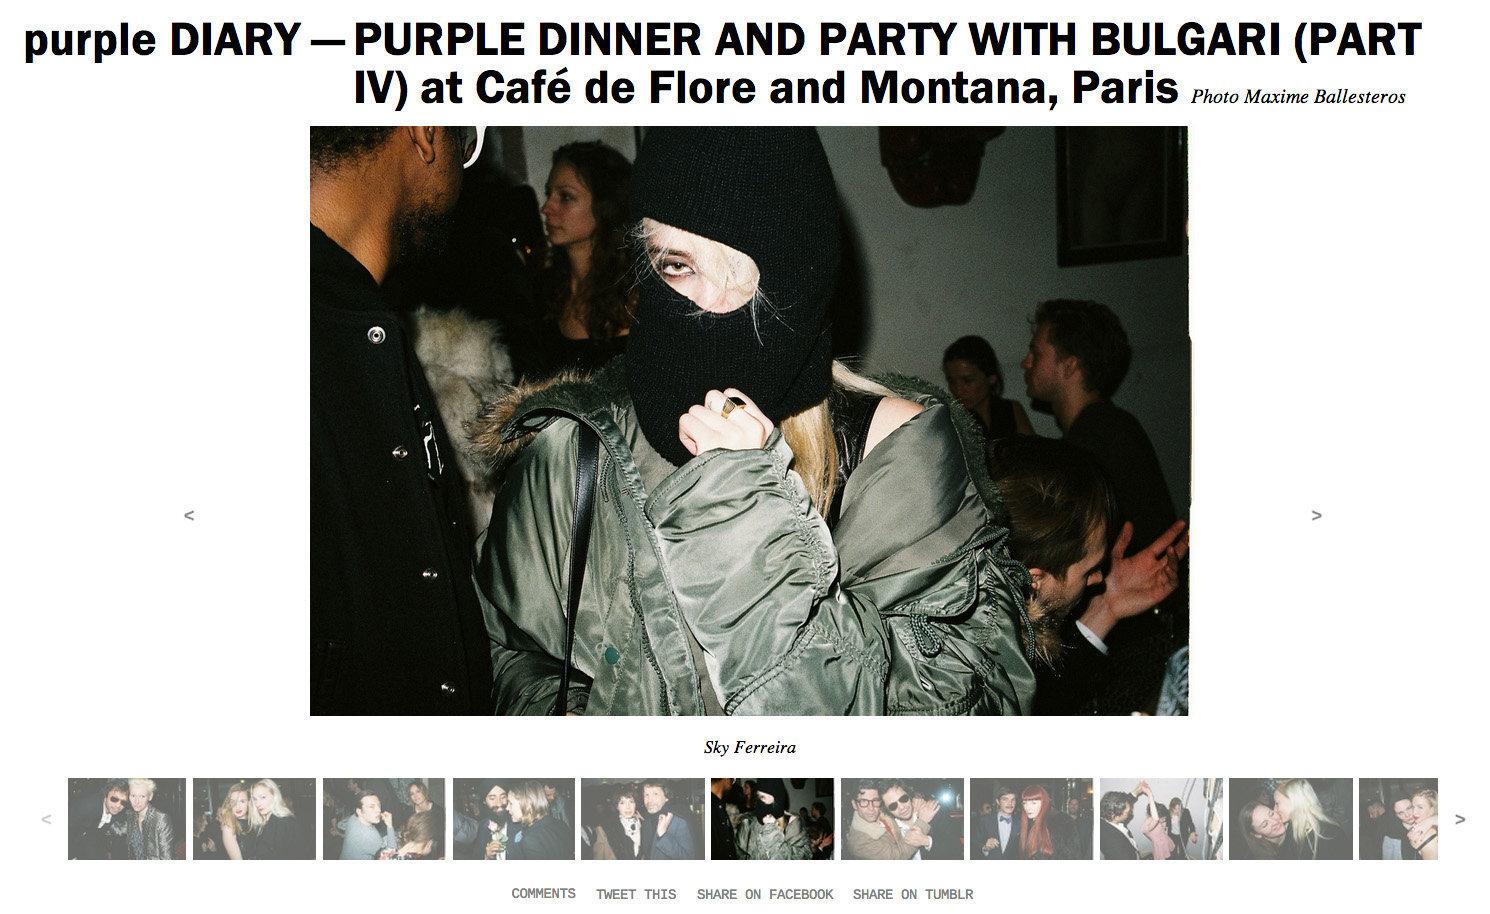 purple DIARY   PURPLE DINNER AND PARTY WITH BULGARI  PART IV  at Café de Flore and Montana  Paris.j